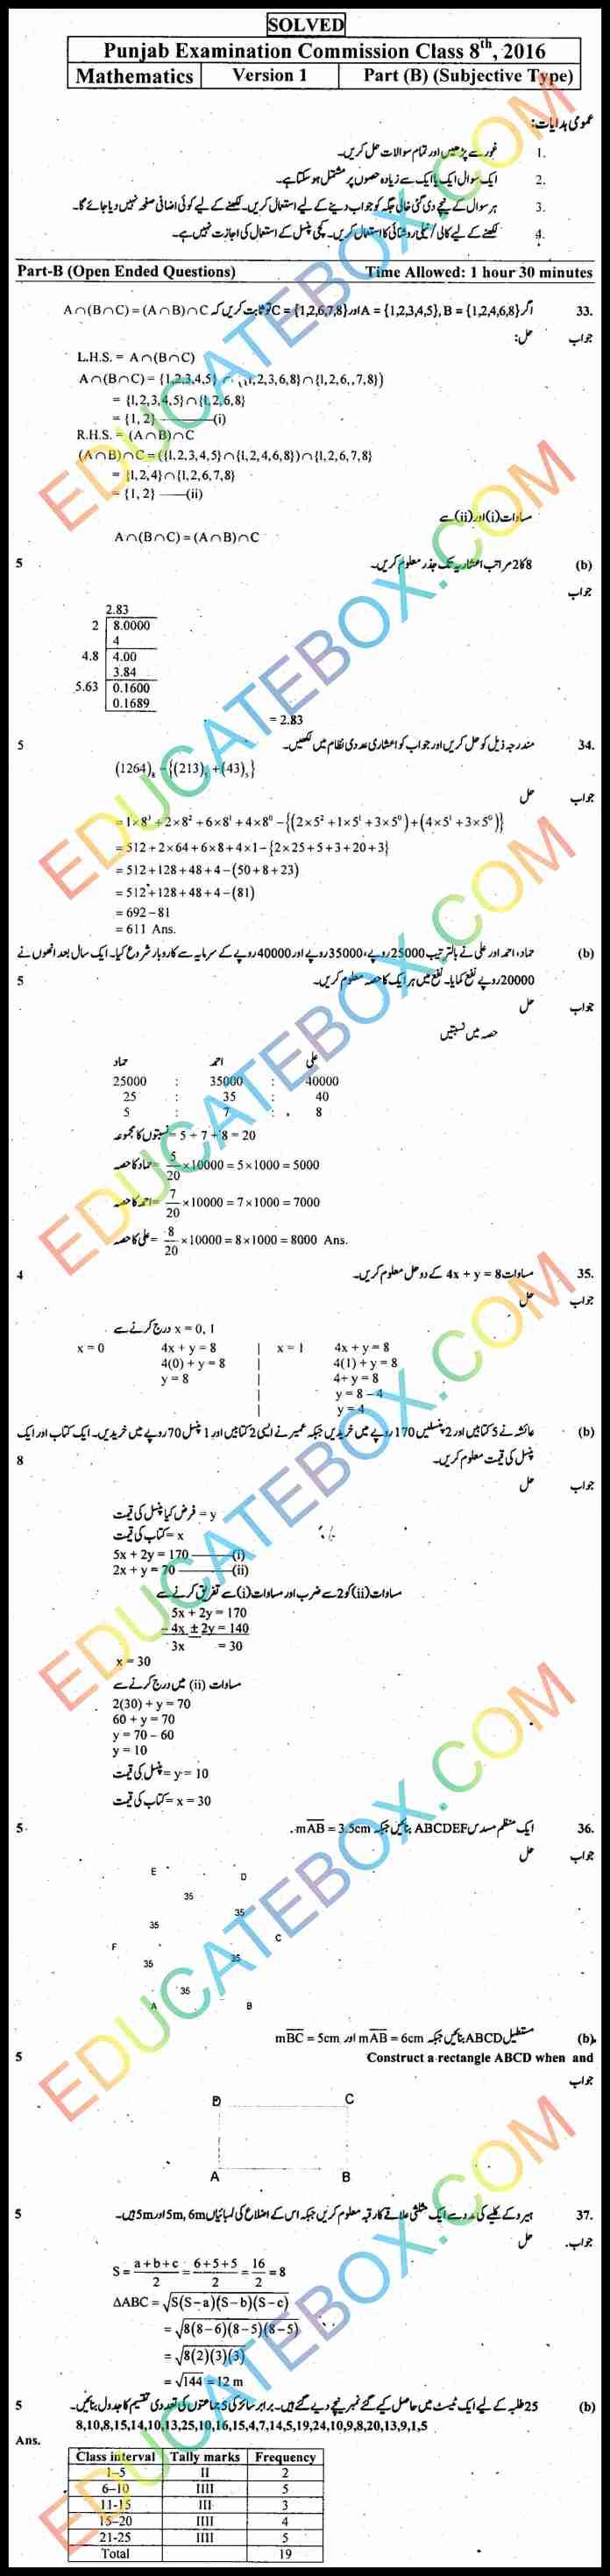 Past Paper 8th Class Maths 2016 Solved Paper Punjab Board (PEC) Subjective Type Urdu Medium Version 1 اپ ٹو ڈیٹ پیپر ہشتم کلاس ریاضی حل شدہ پیپر پنجاب بورڈ سبجیکٹیو ٹائپ انگلش میڈیم ورژن 1